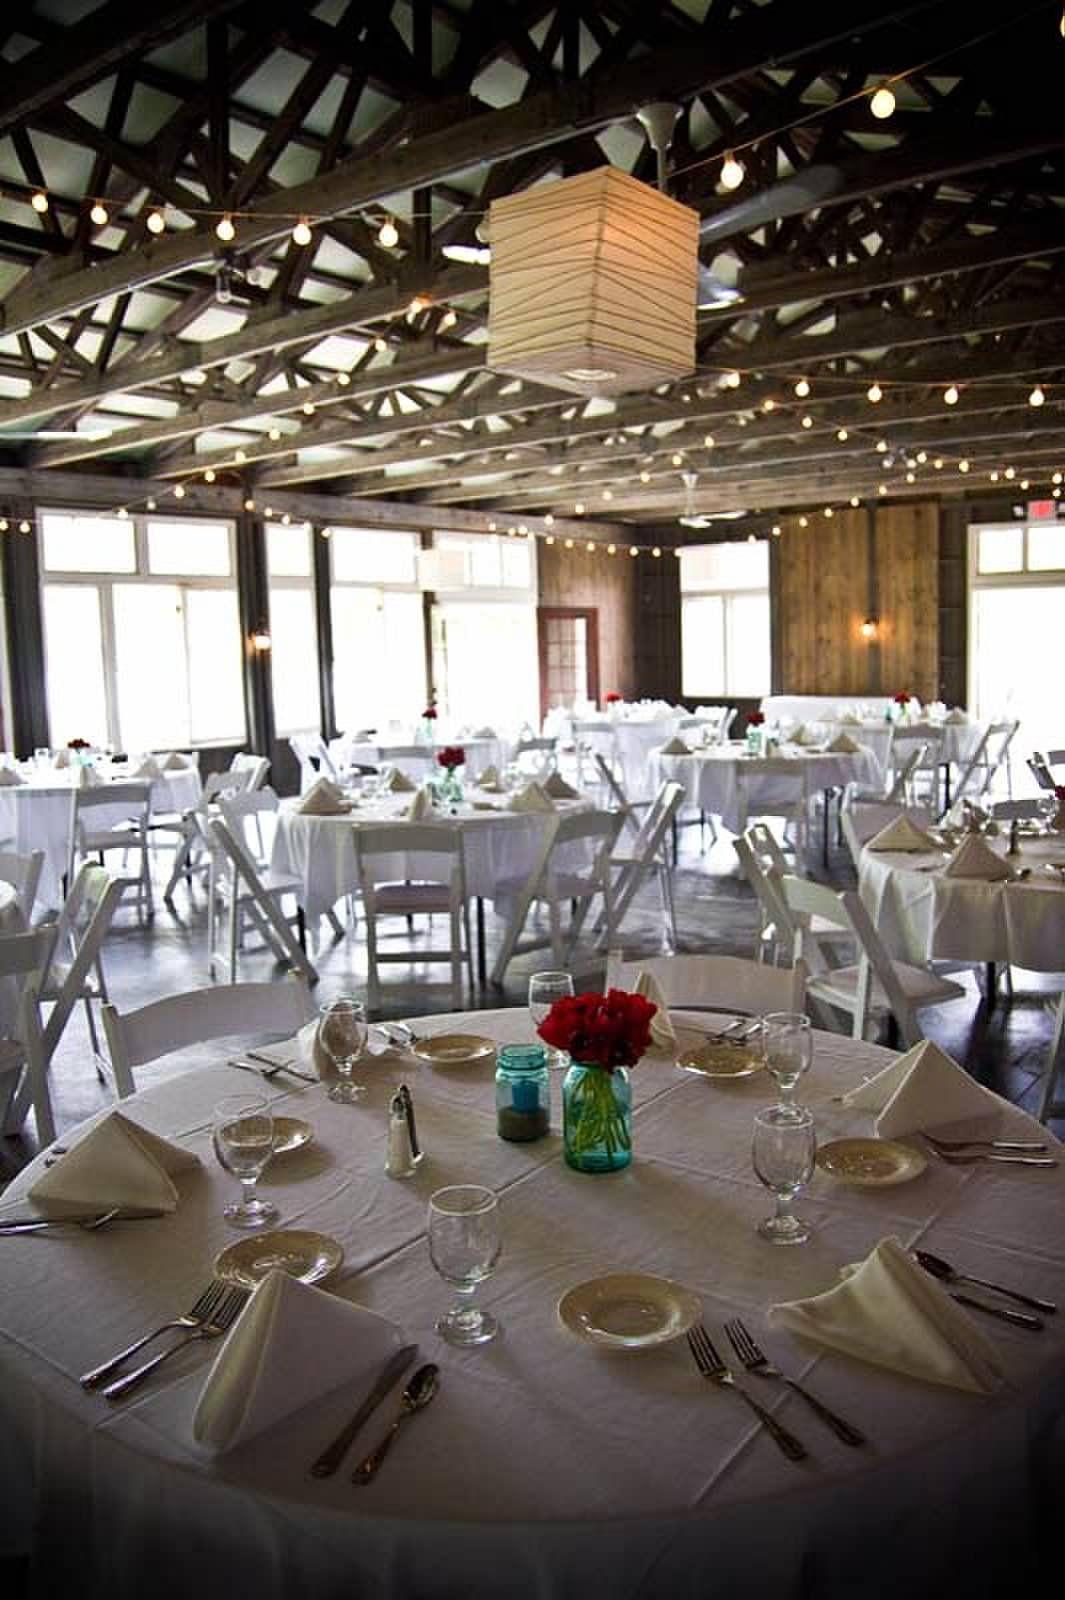 Millcreek Barns Southwest Michigan Venue